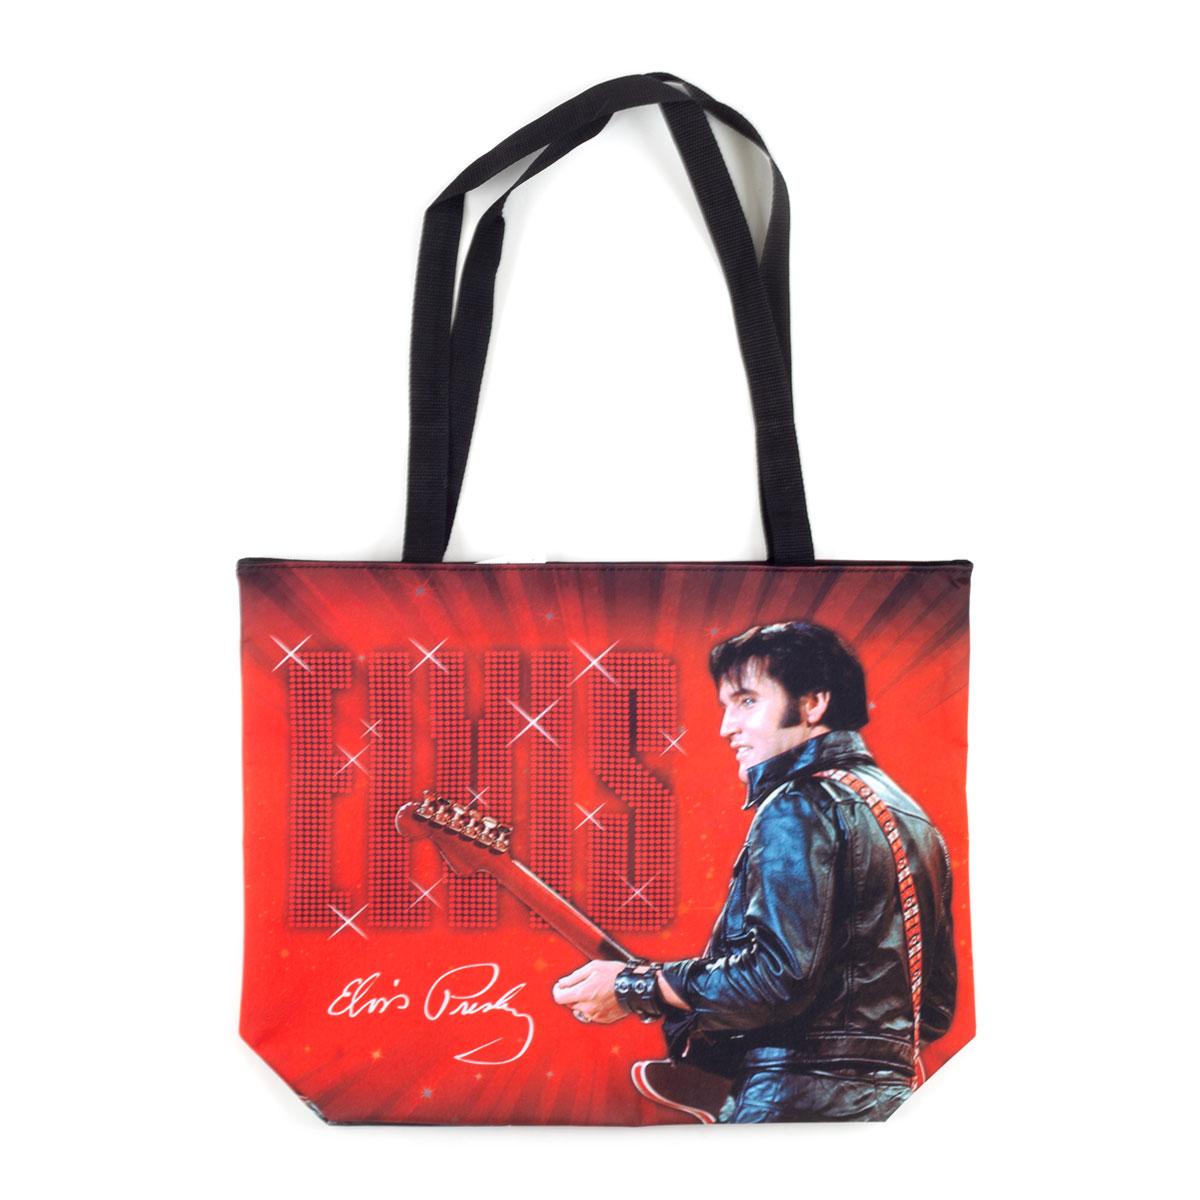 Elvis '68 Special Tote Bag